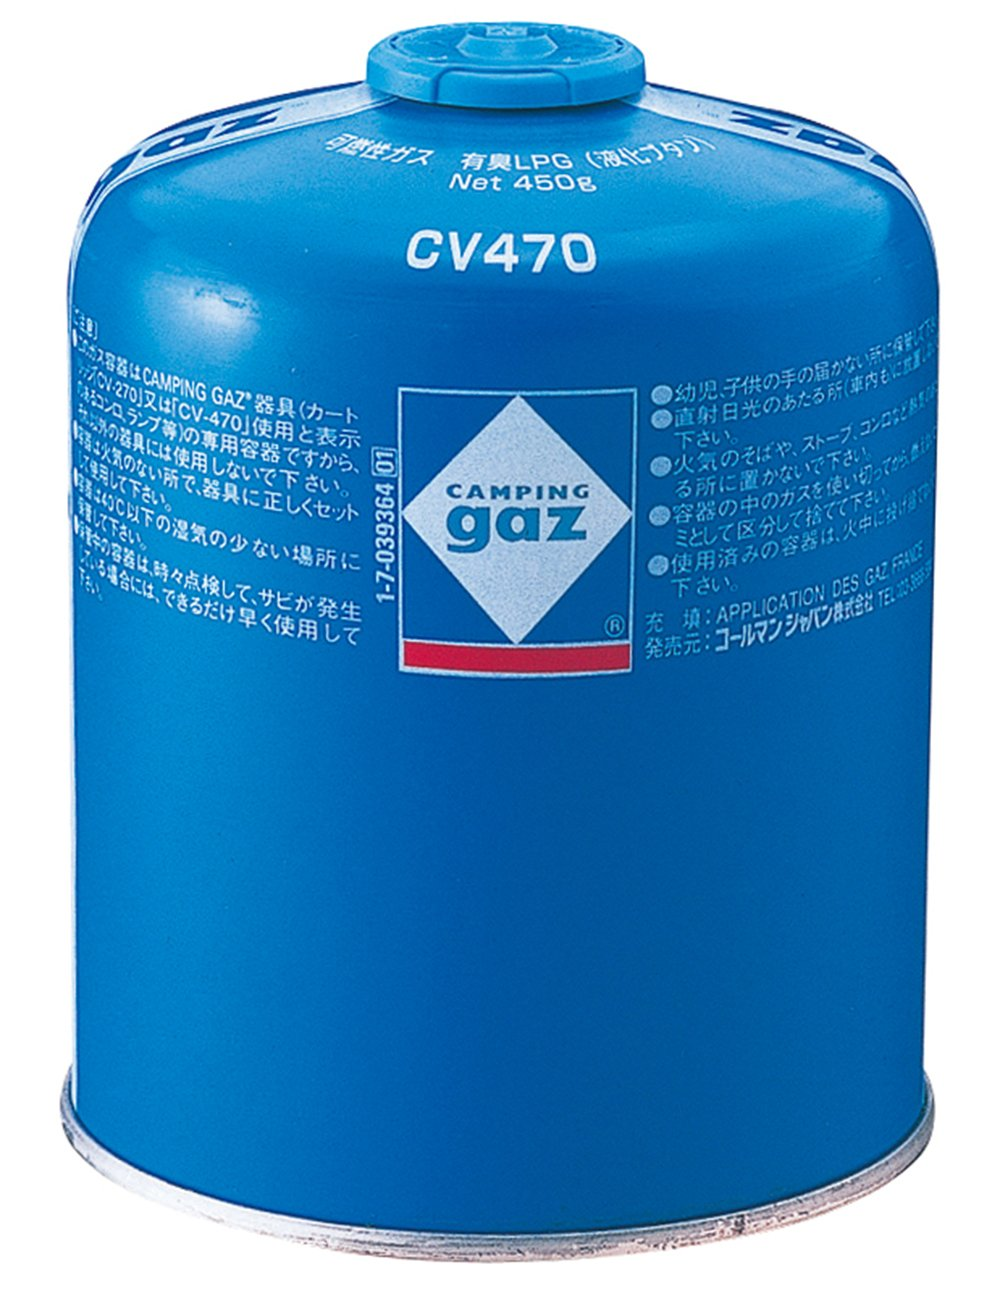 Coleman M39557 Cartucho camping gaz cv-470